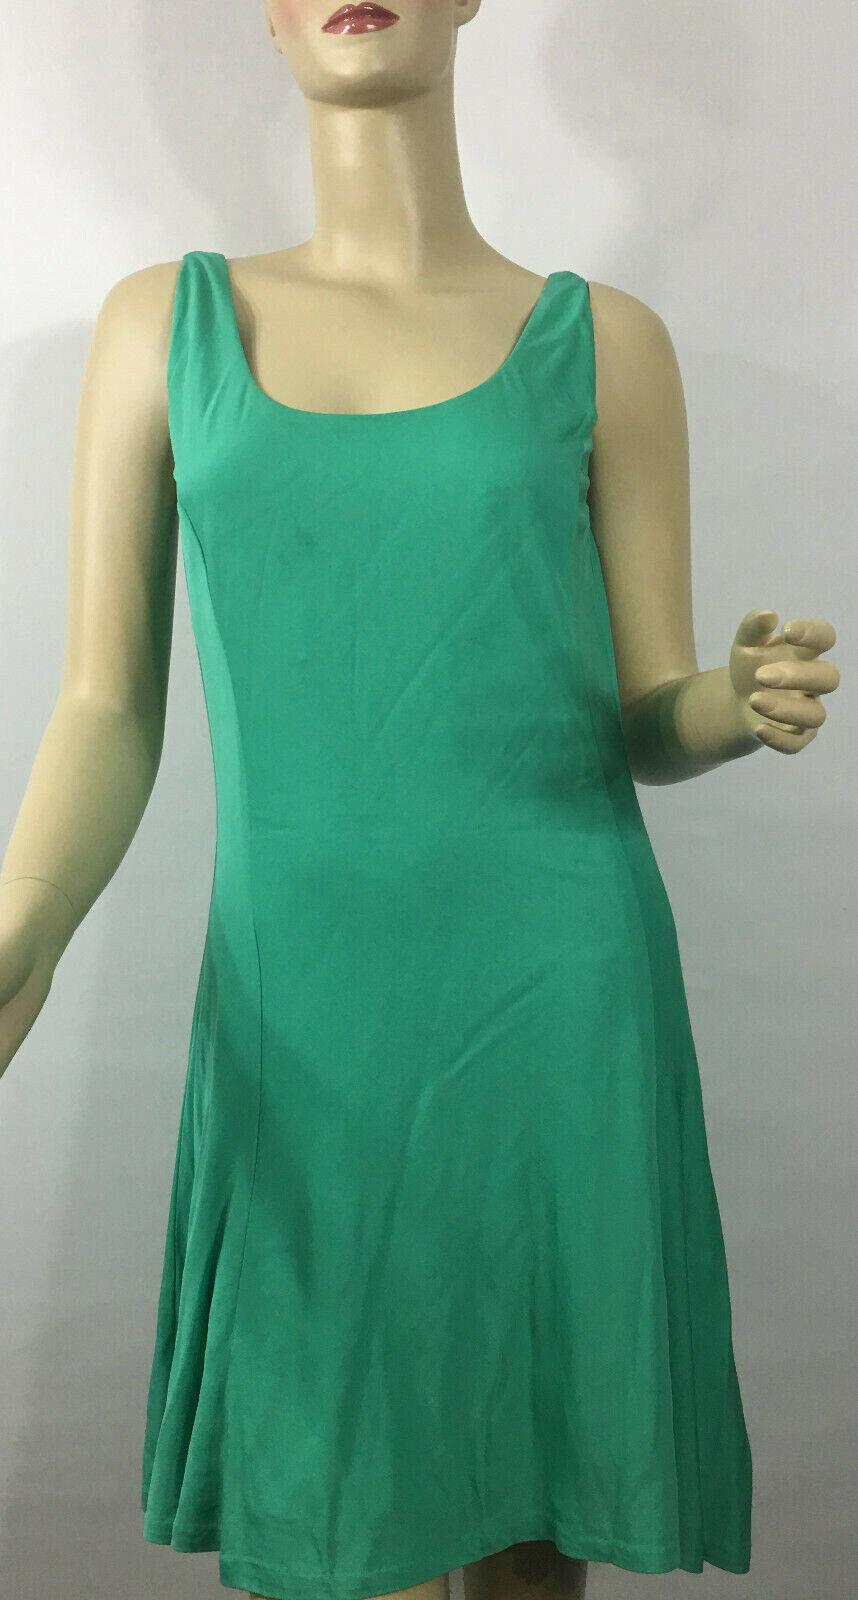 Ralph Lauren Blau Label Tank Dress Medium Grün Lined Party Cruise